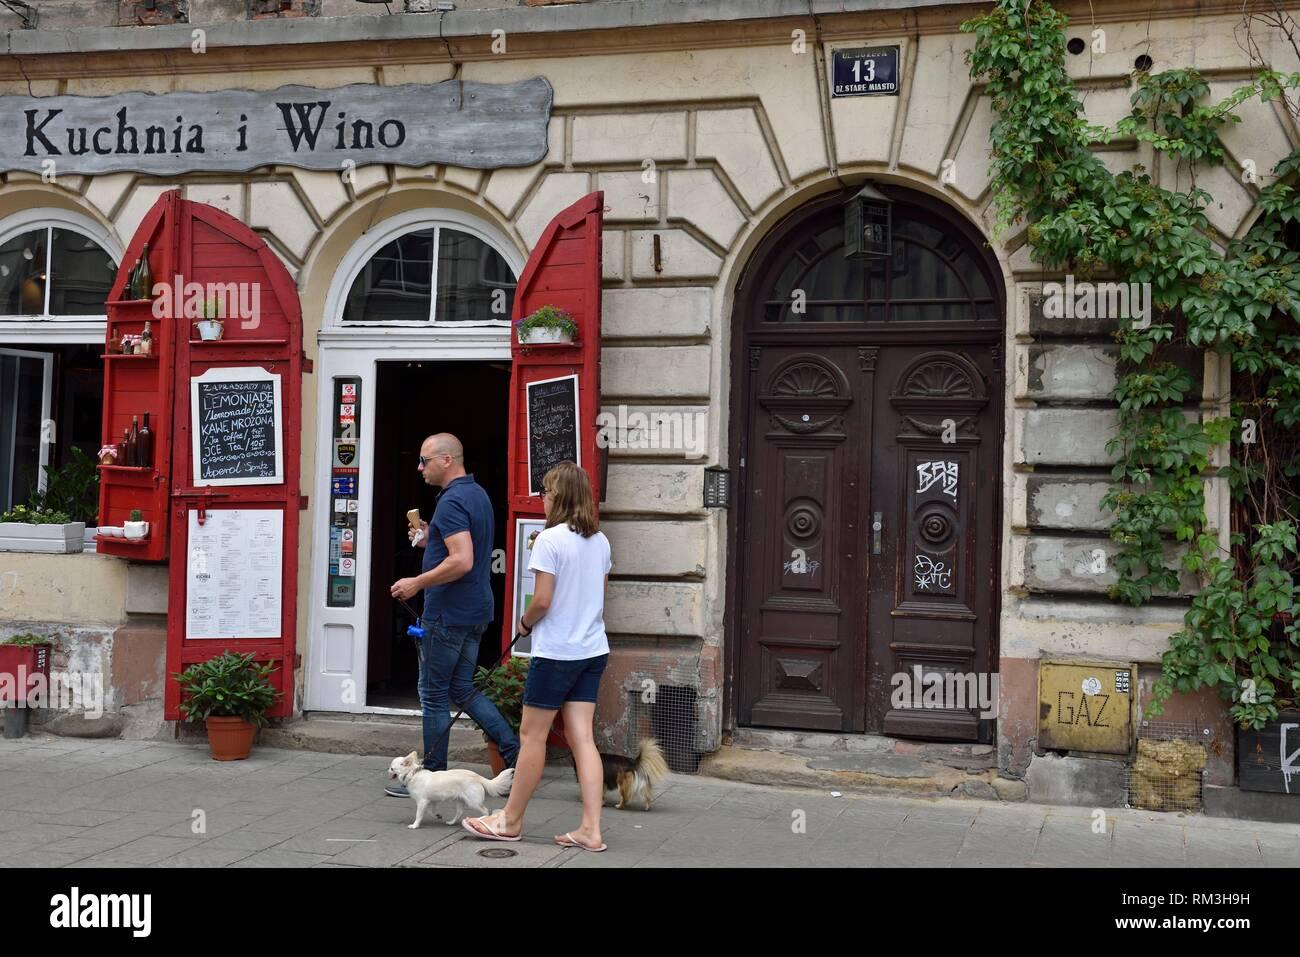 Kuchnia I Wino Restaurant In Jozefa Street District Of